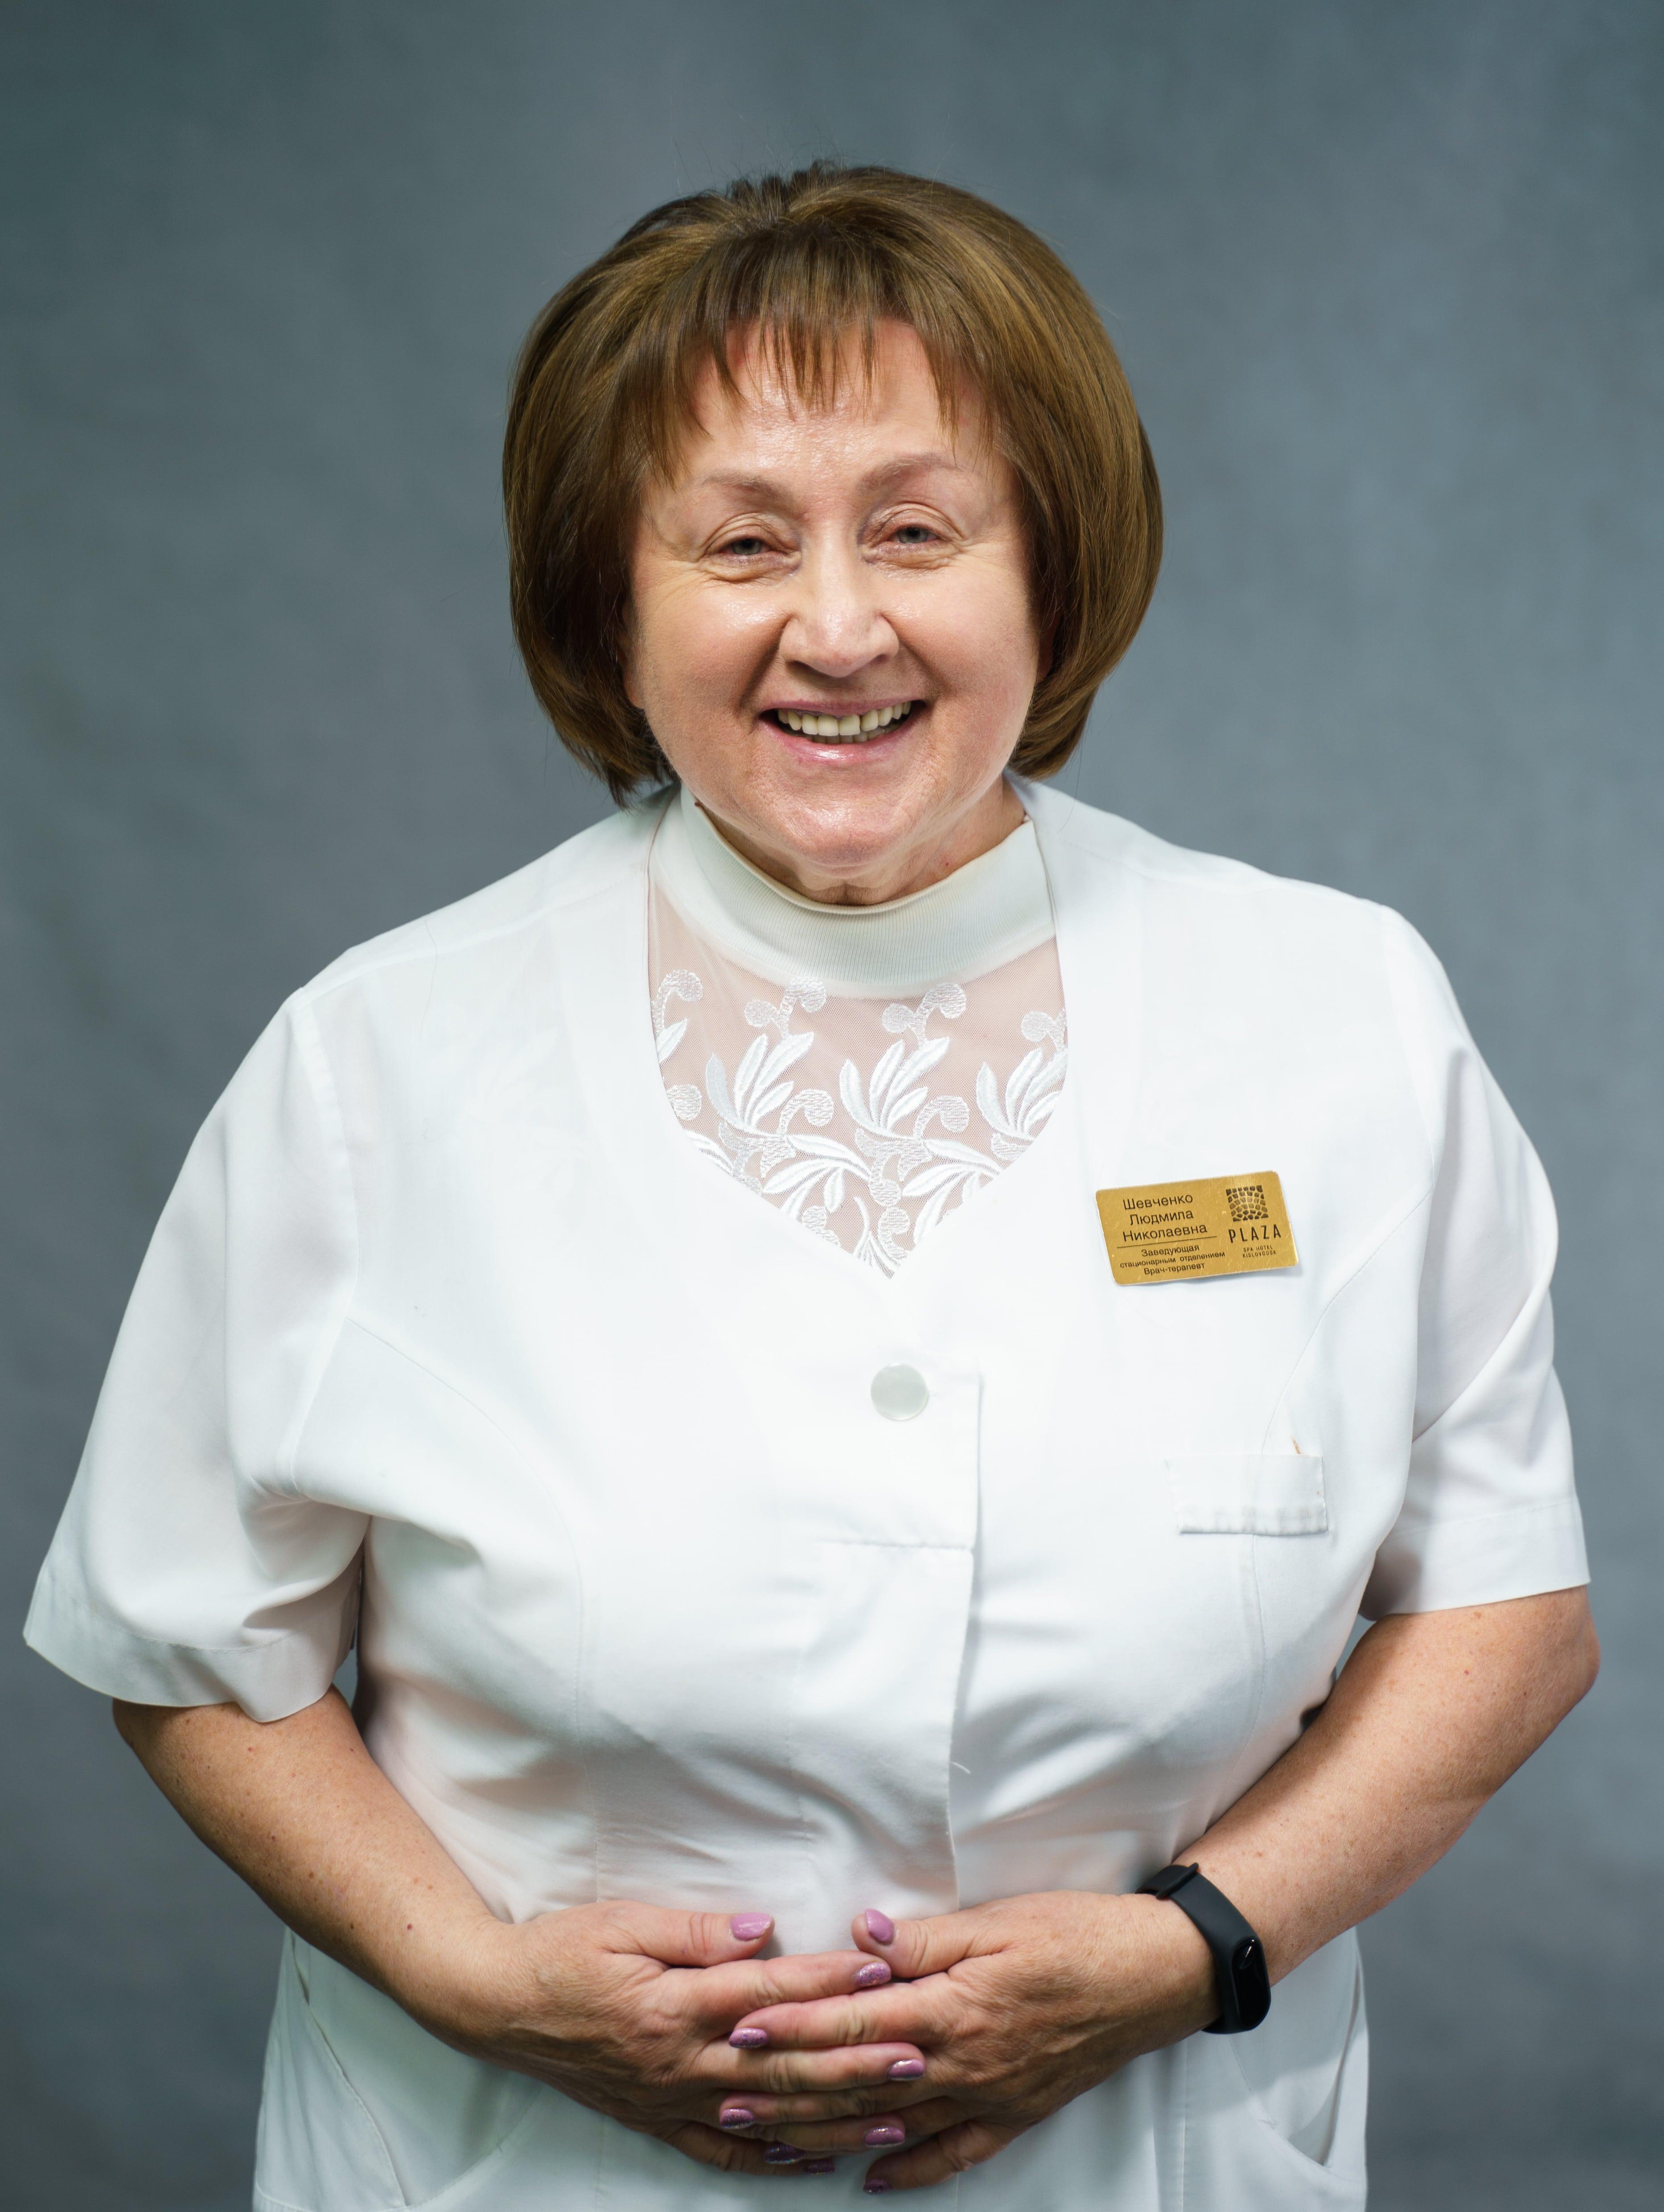 Шевченко Людмила Николаевна